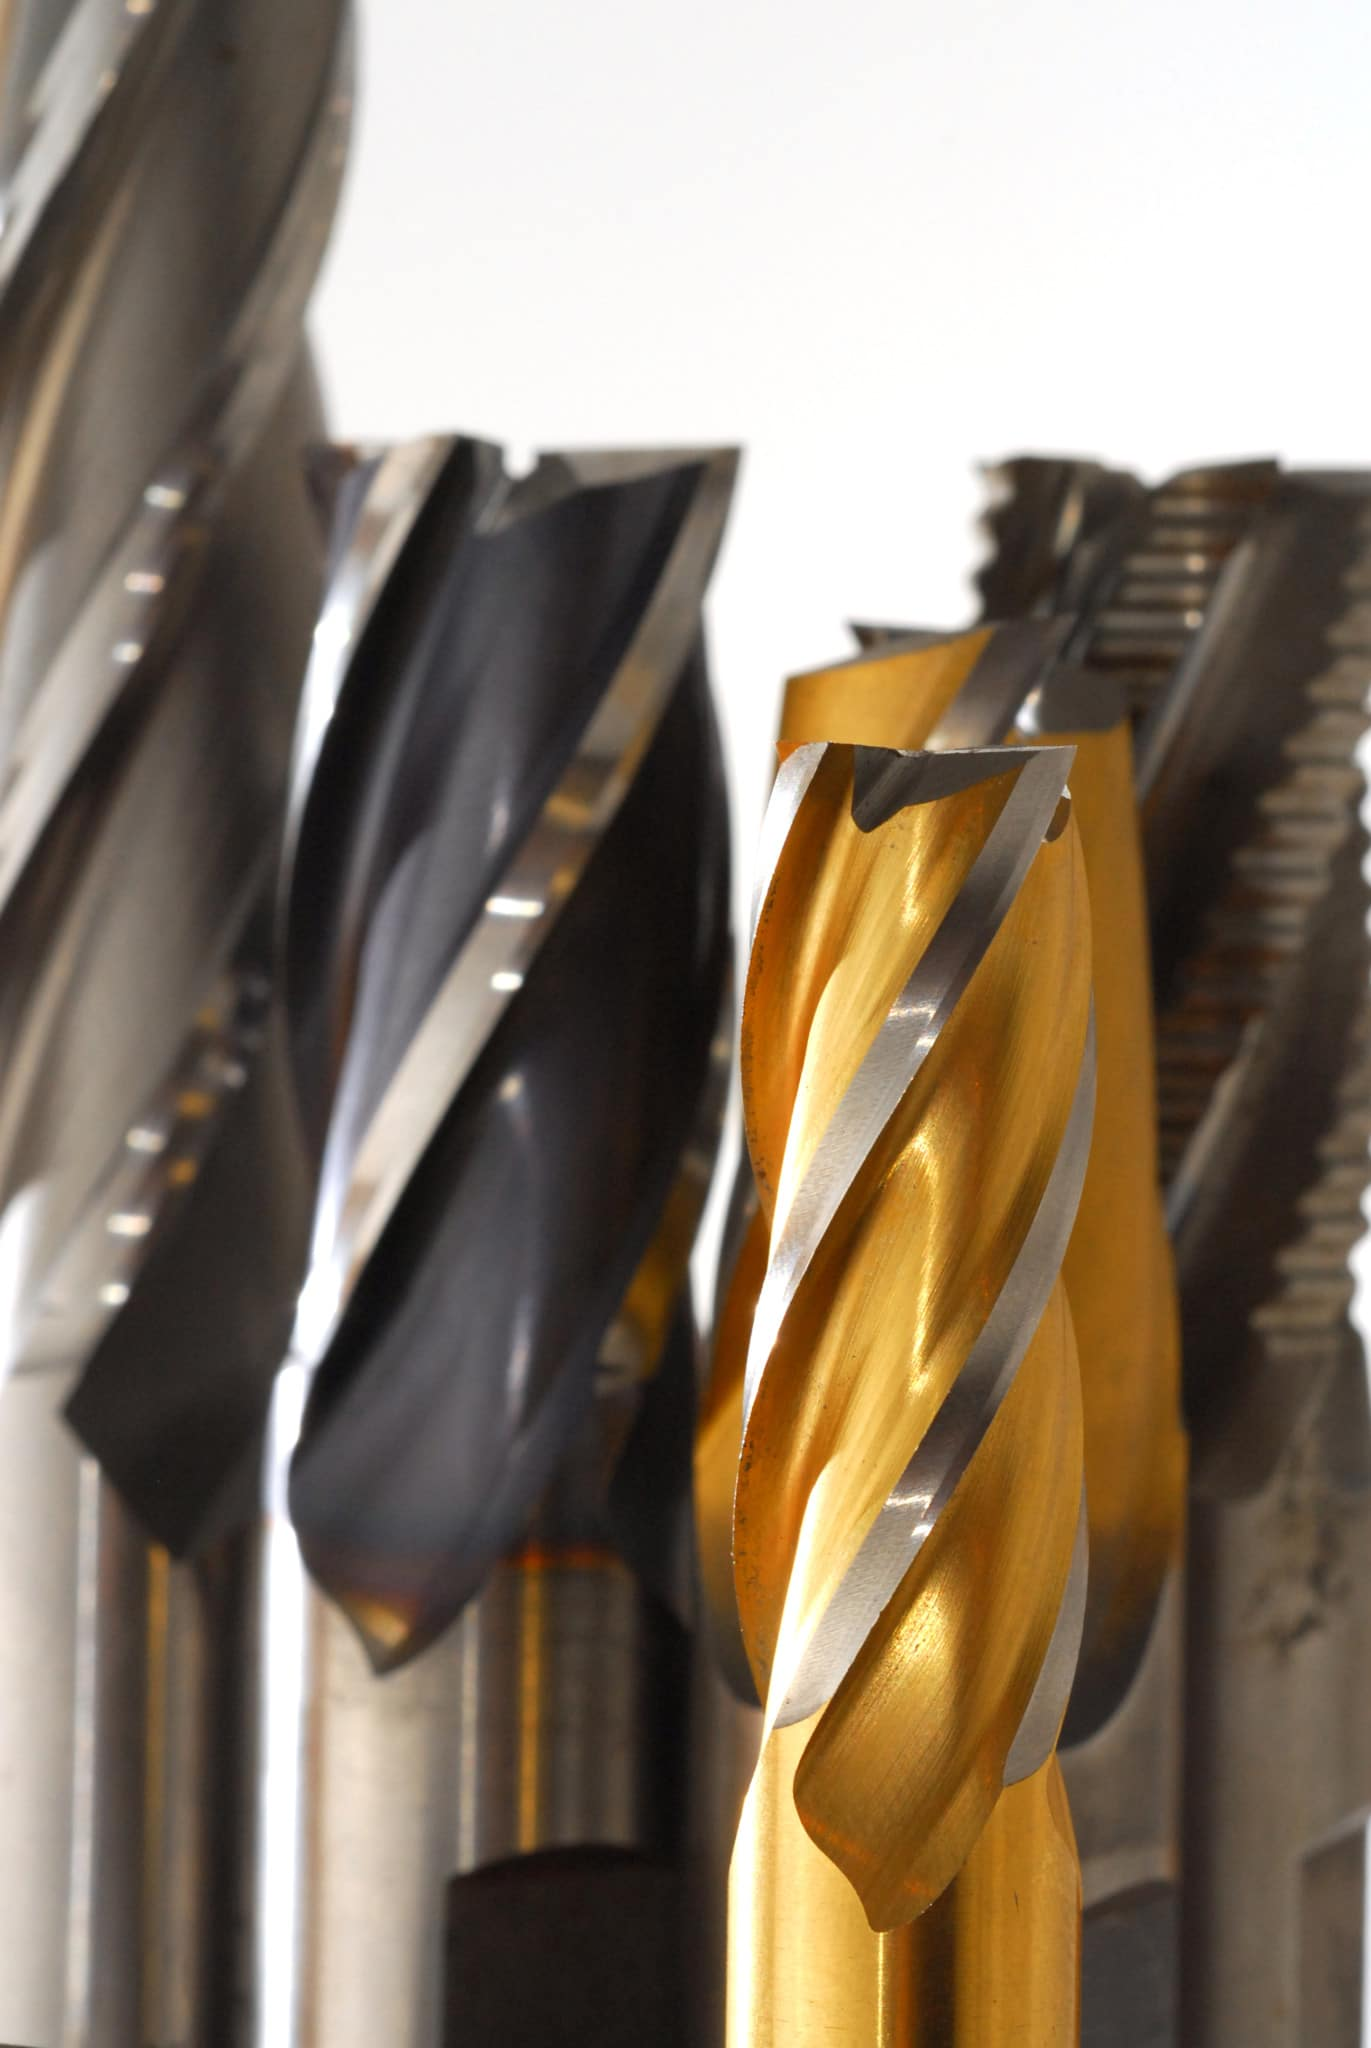 slipservice hårdmetallverktyg